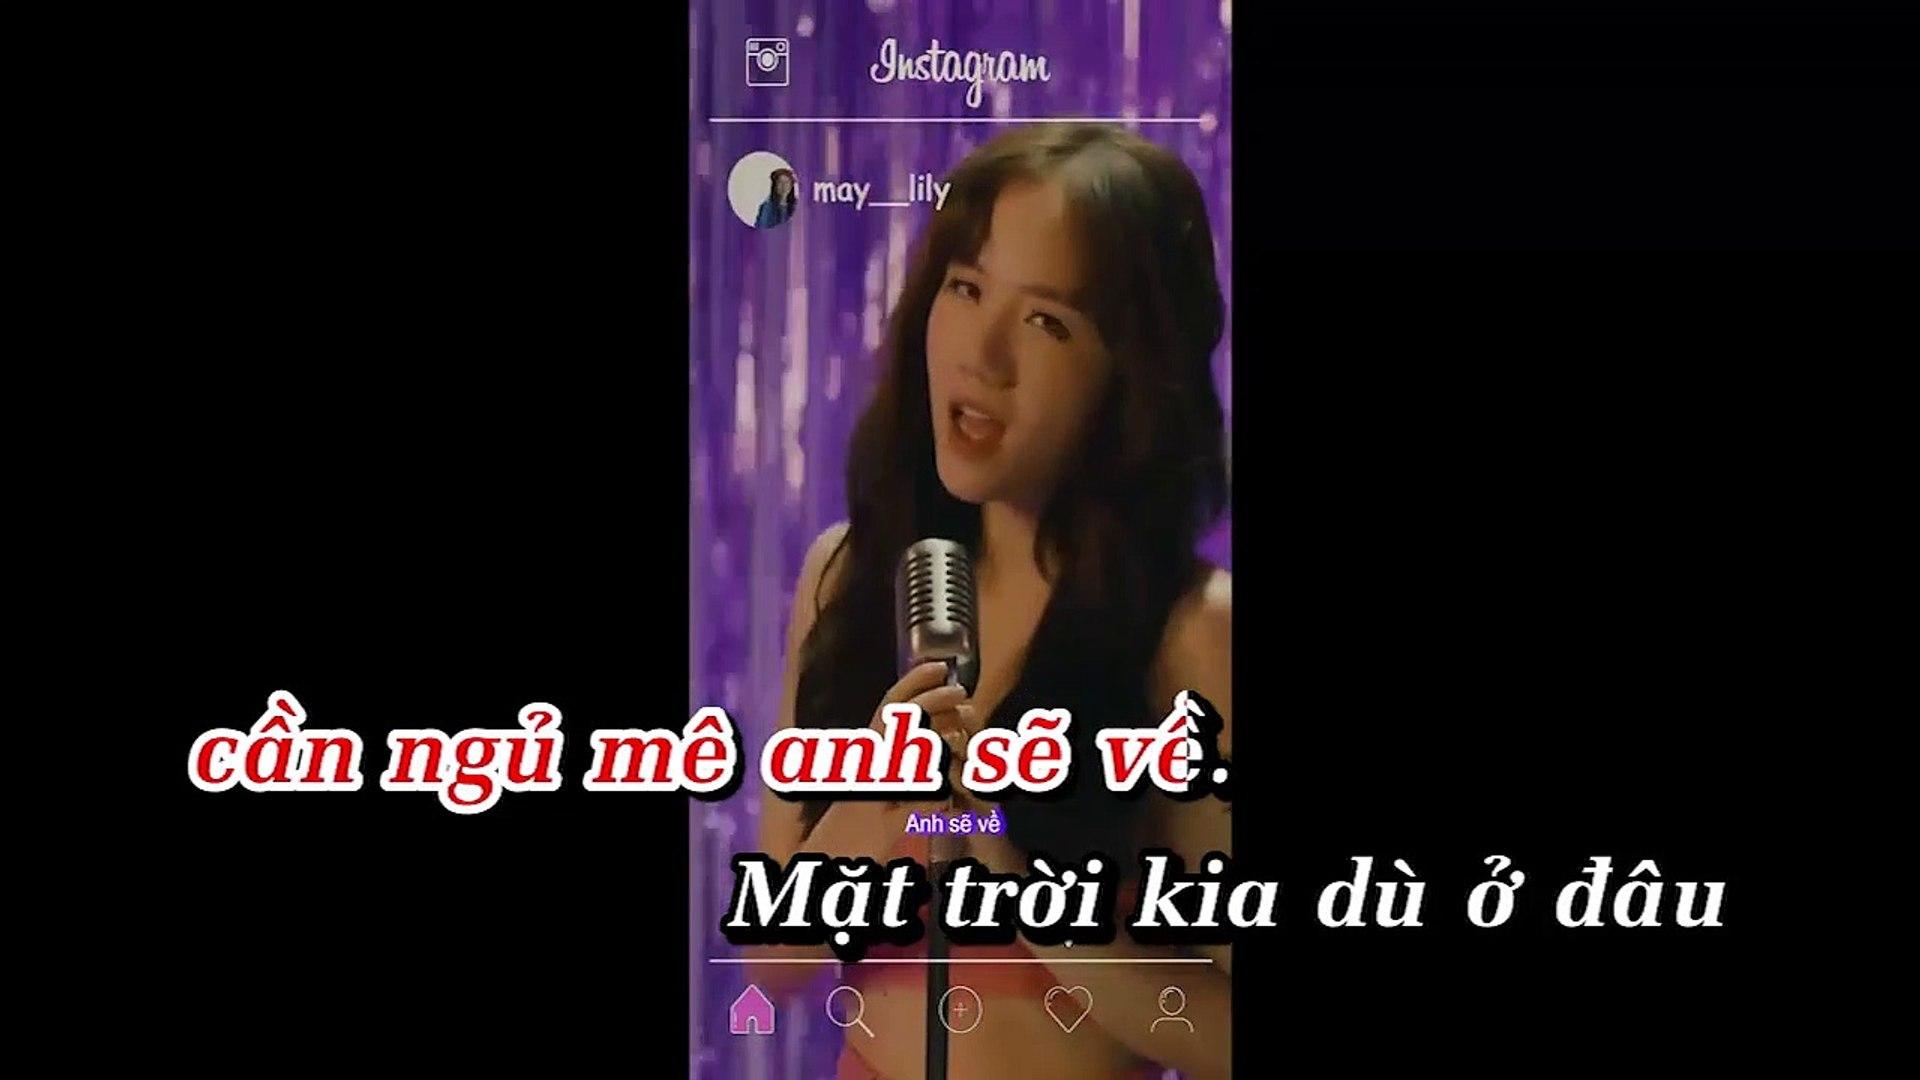 [Karaoke] Mặt Trời Của Em - Phương Ly Ft. Justatee [Beat]